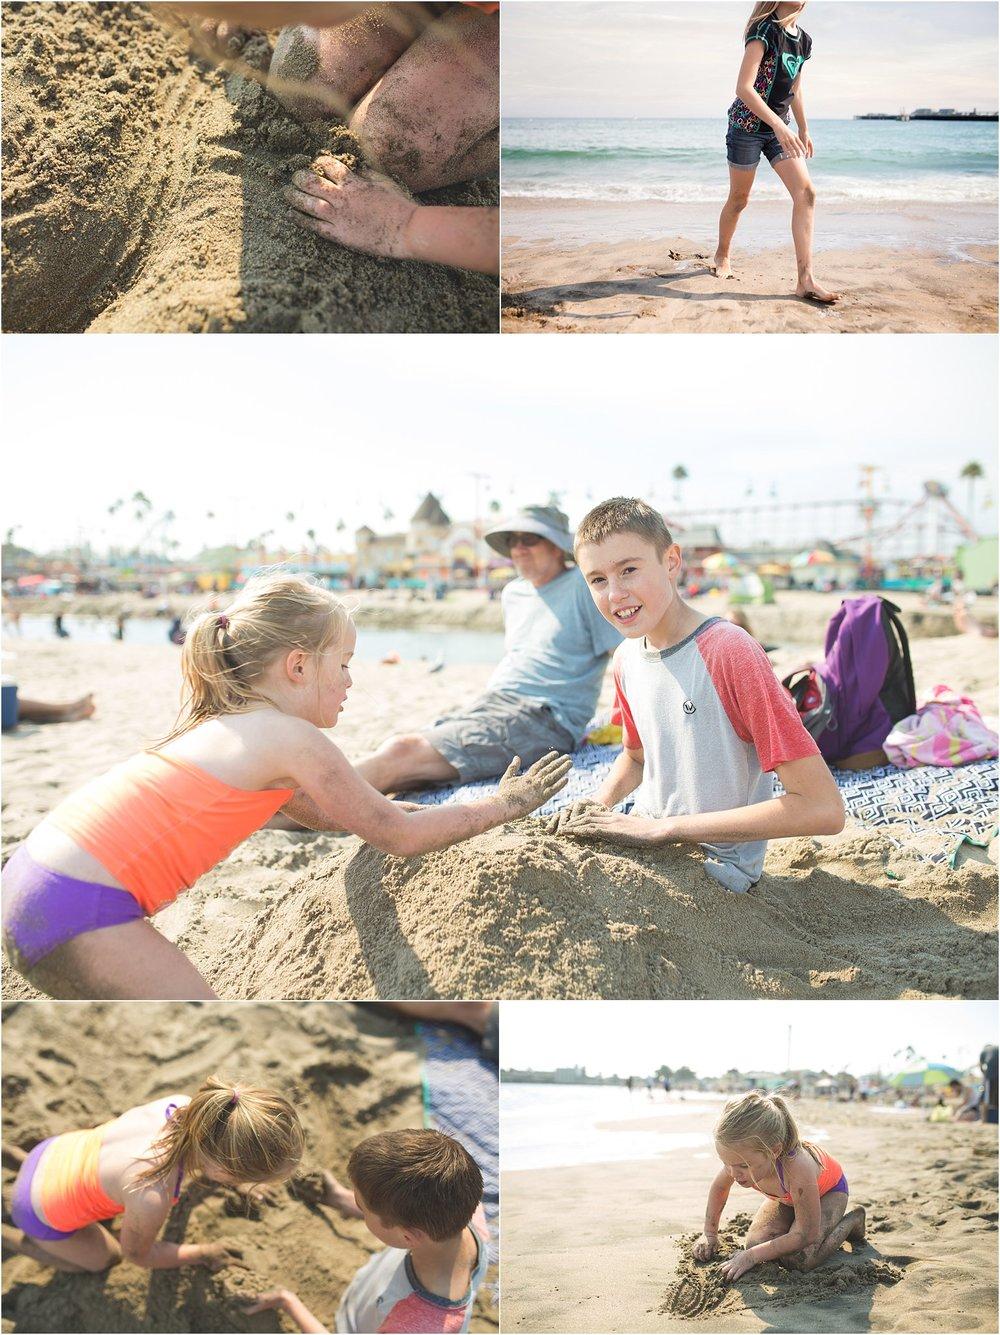 Santa Cruz Boardwalk Beach | Family Camp Trip | Mary Humphrey Photography